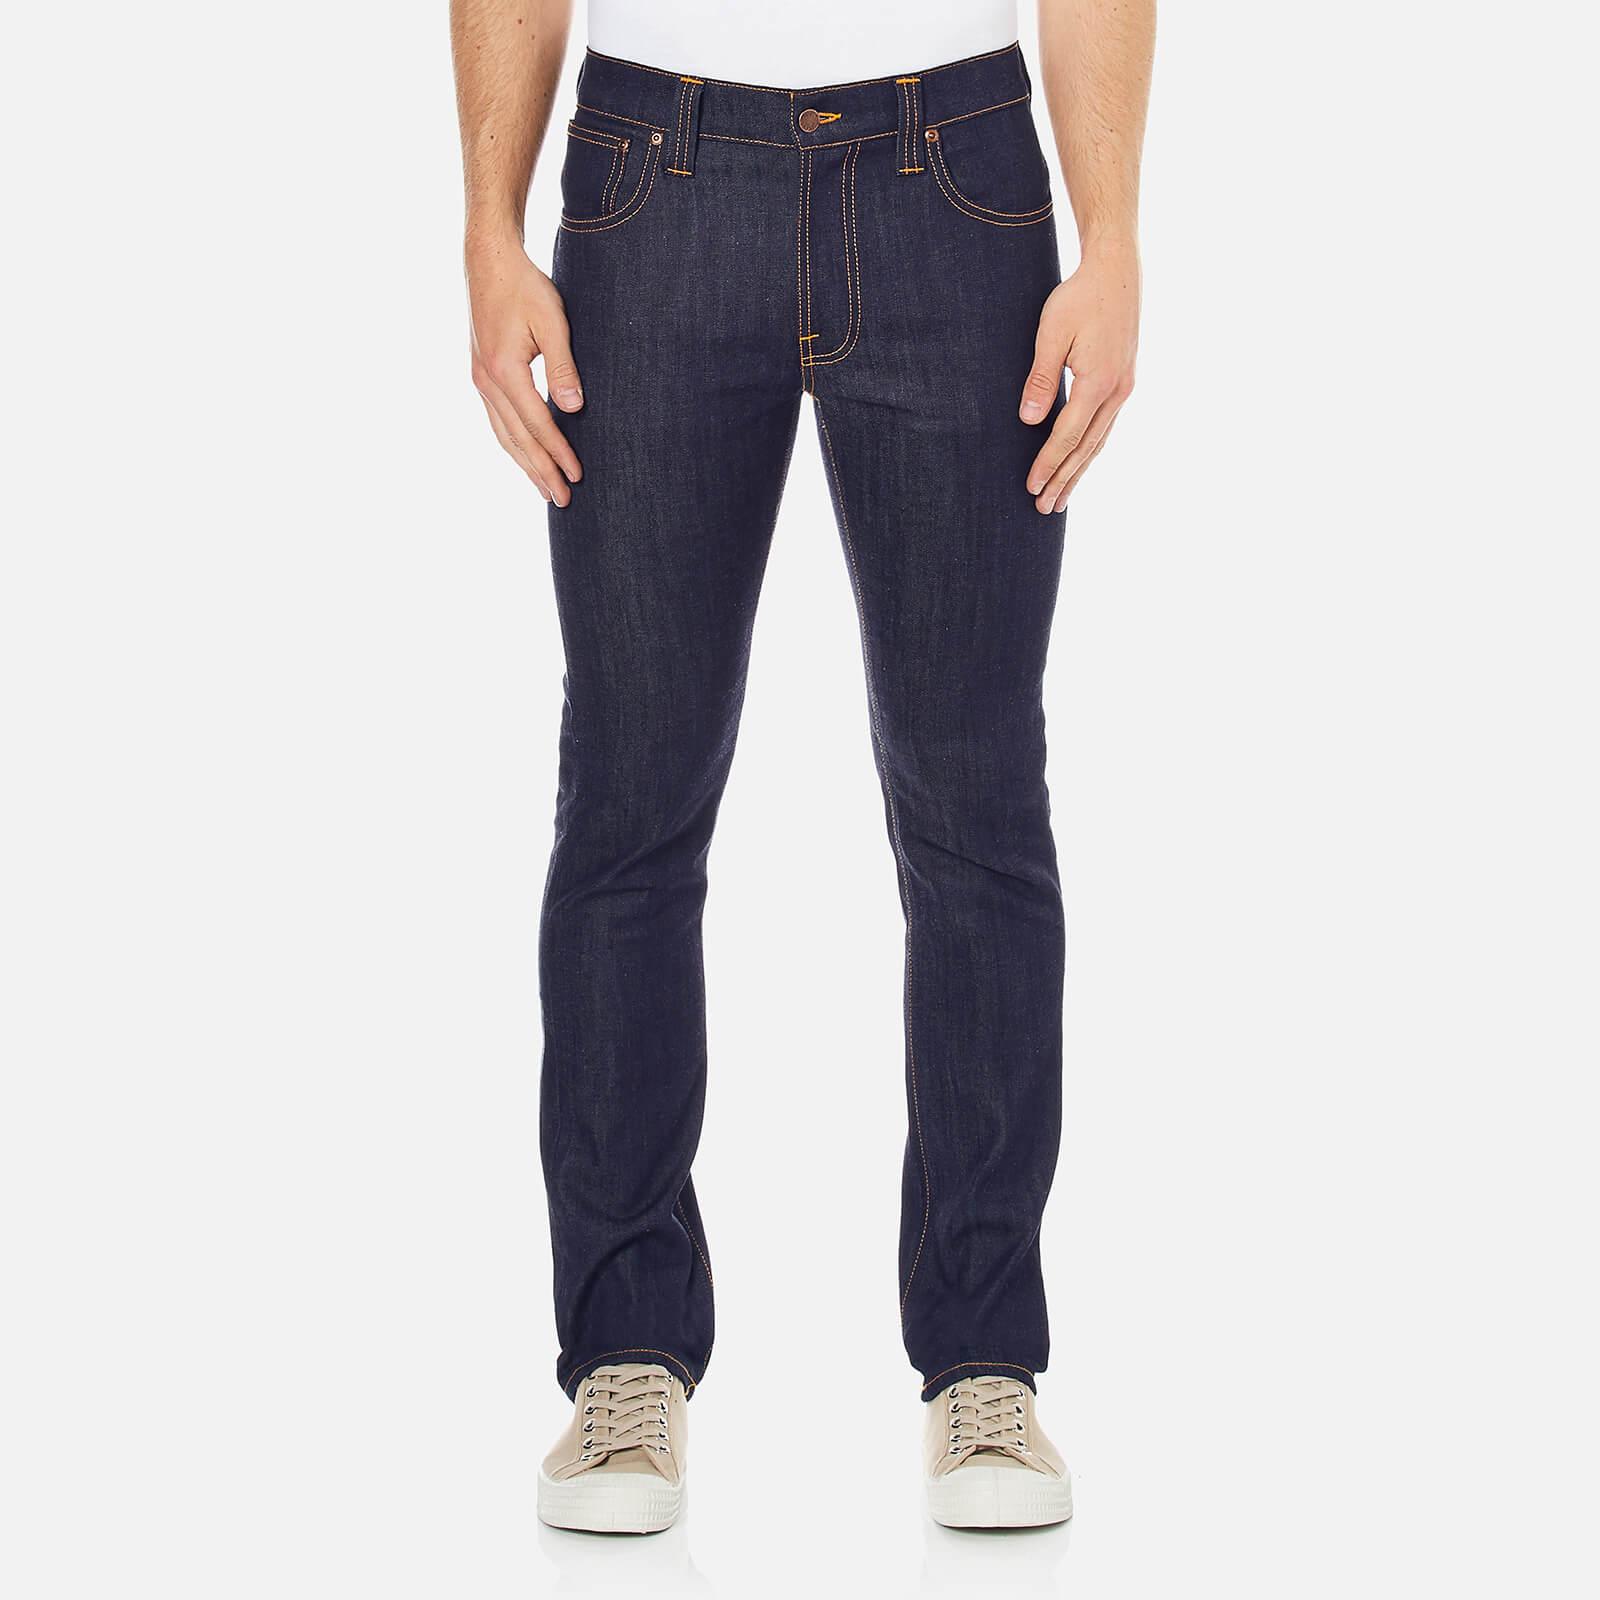 238d5a16c26a Nudie Jeans Men s Thin Finn Skinny Jeans - Dry Ecru Embo - Free UK ...